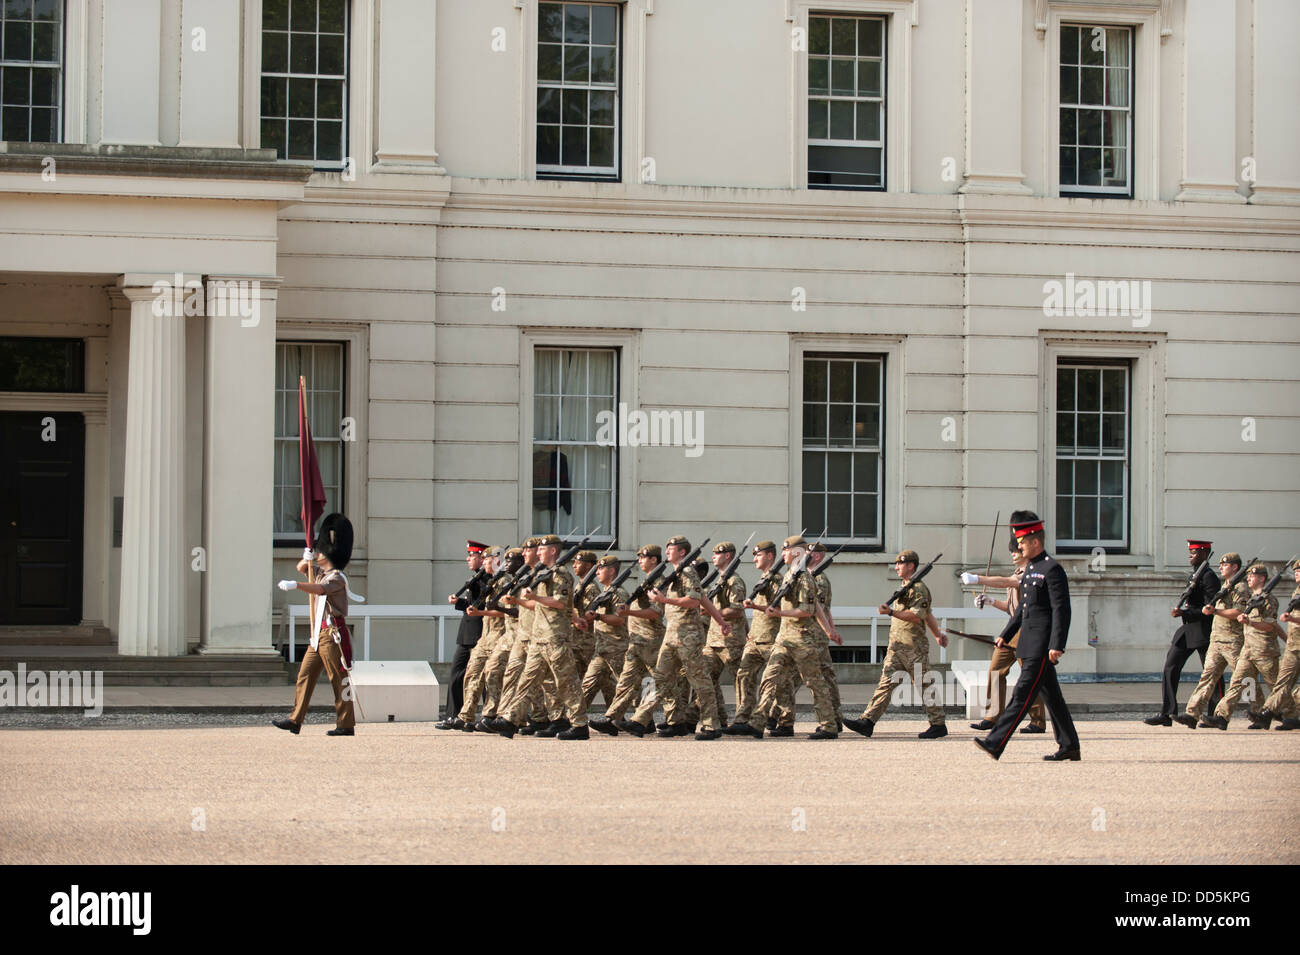 Guardsmen Square Bashing at Wellington Barracks in central London - Stock Image